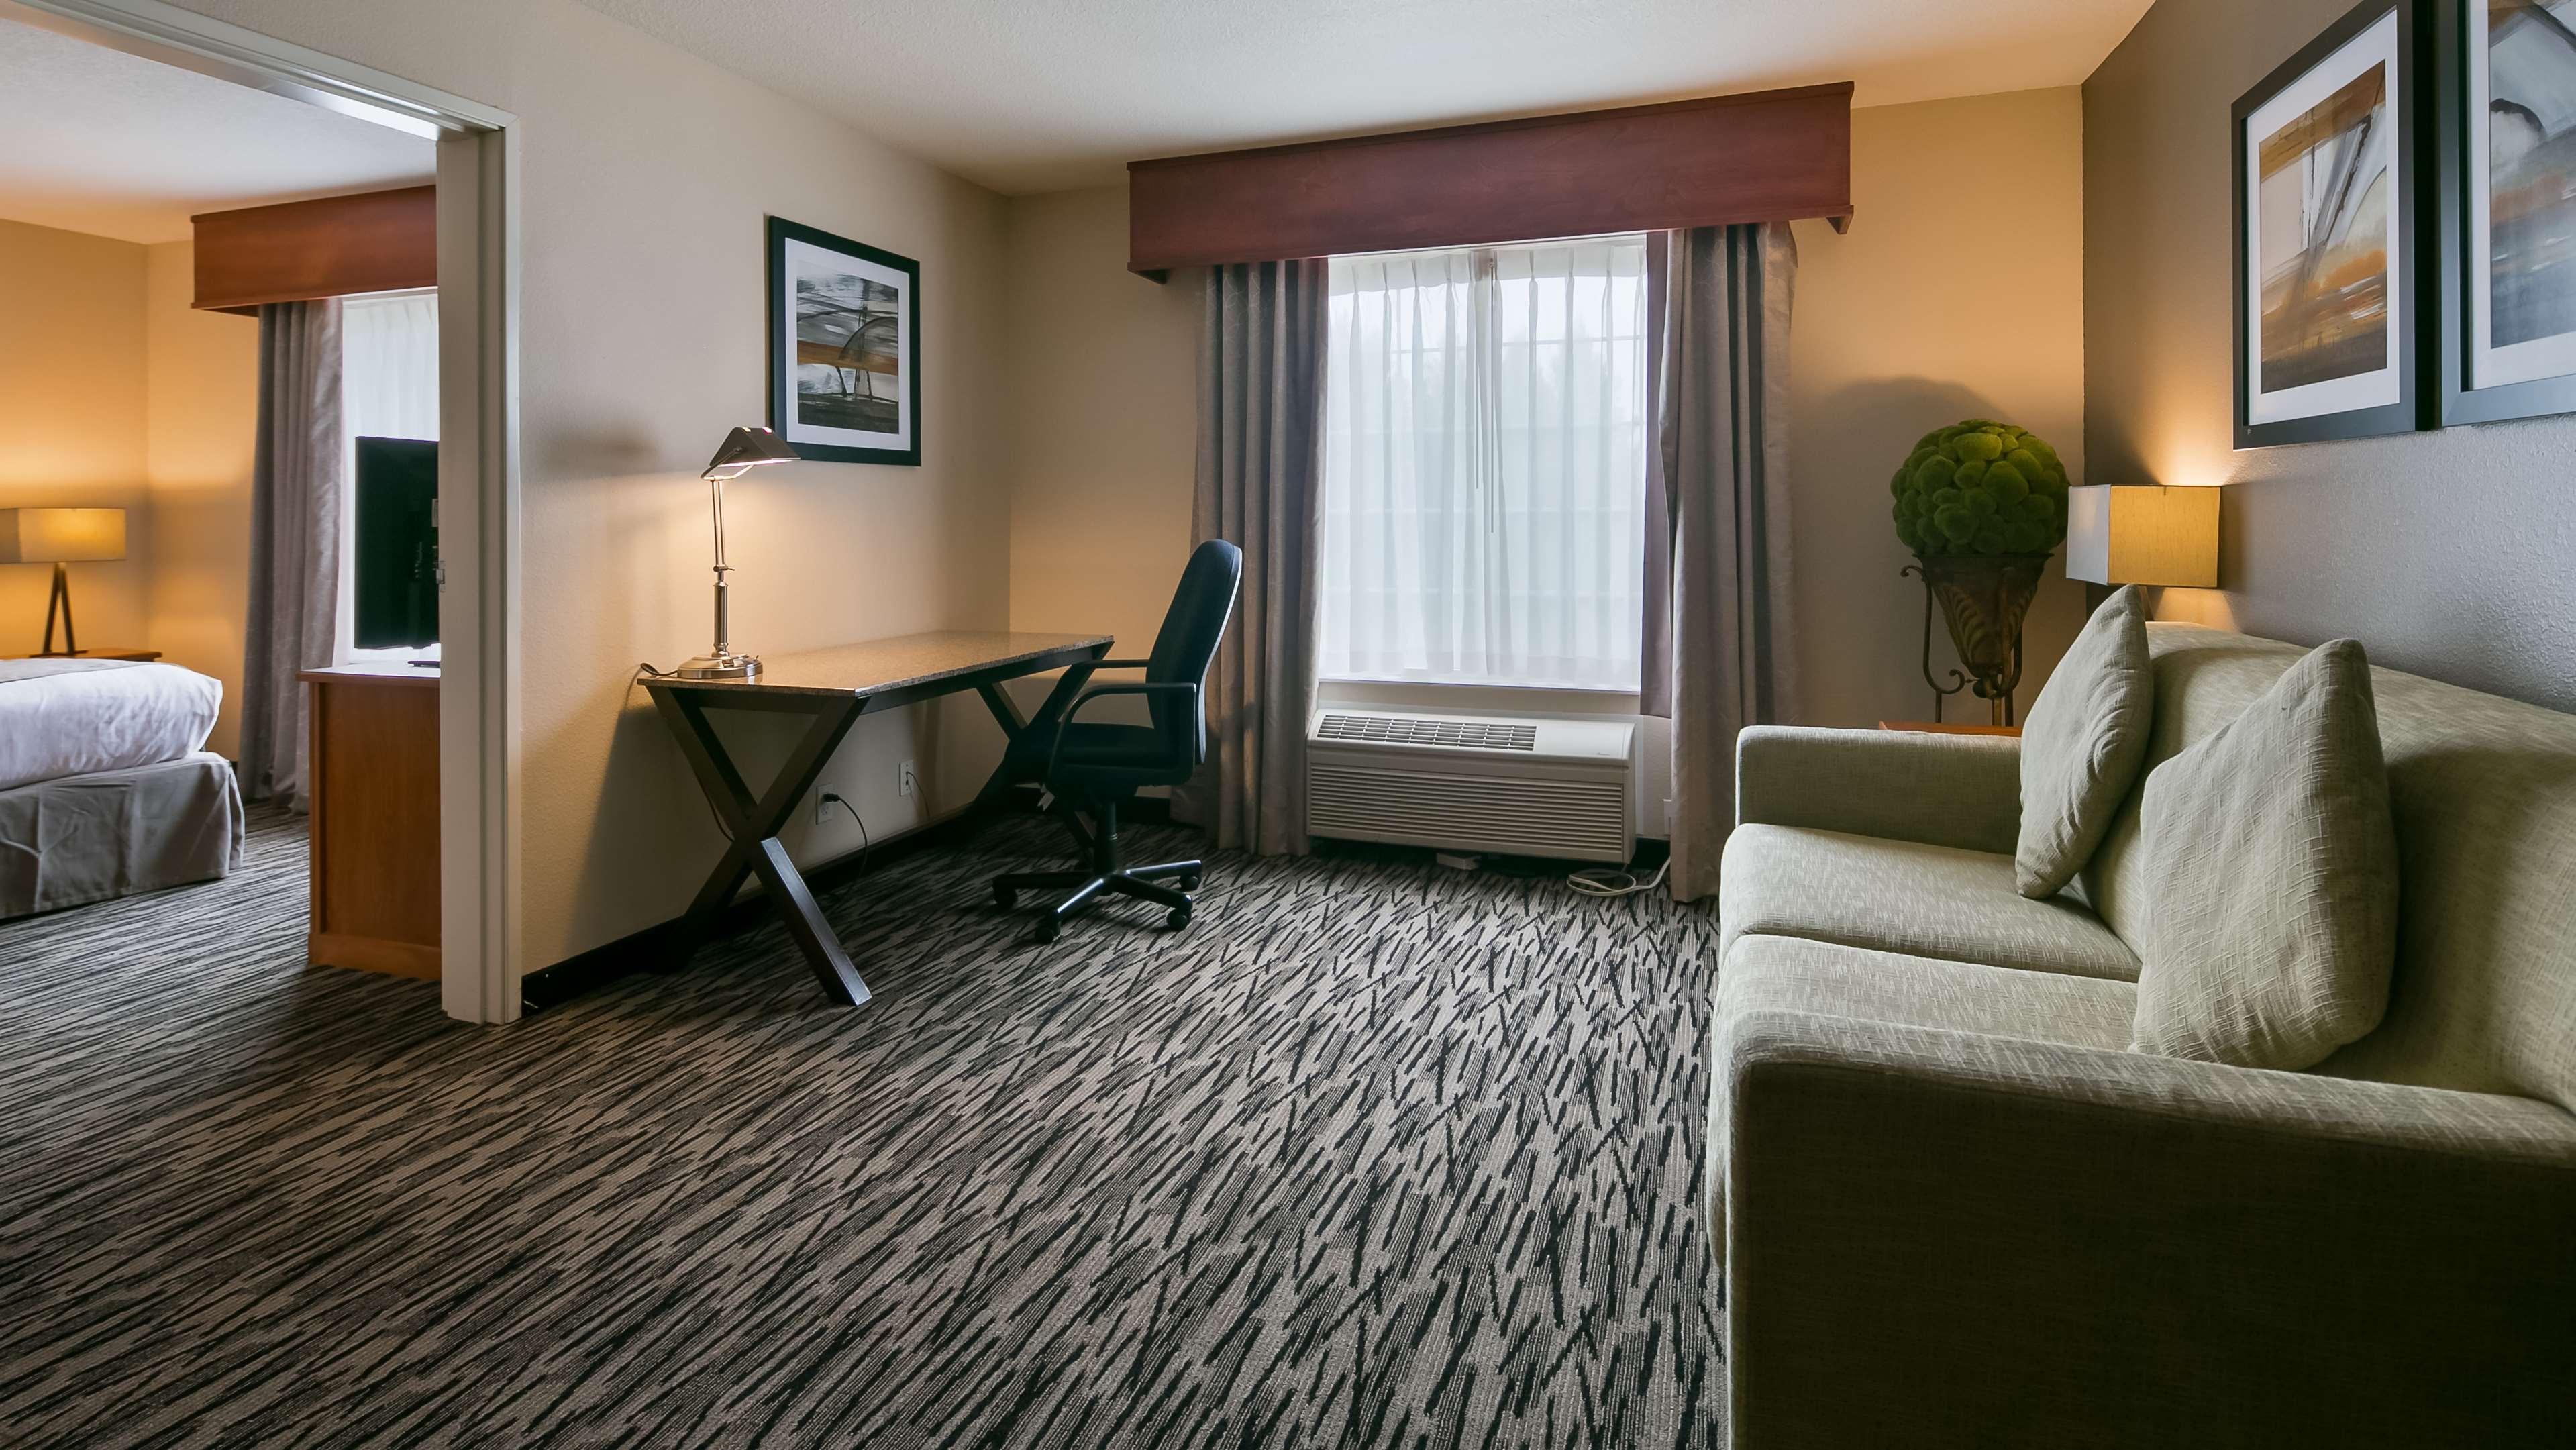 Best Western Plus Mountain View Auburn Inn image 26